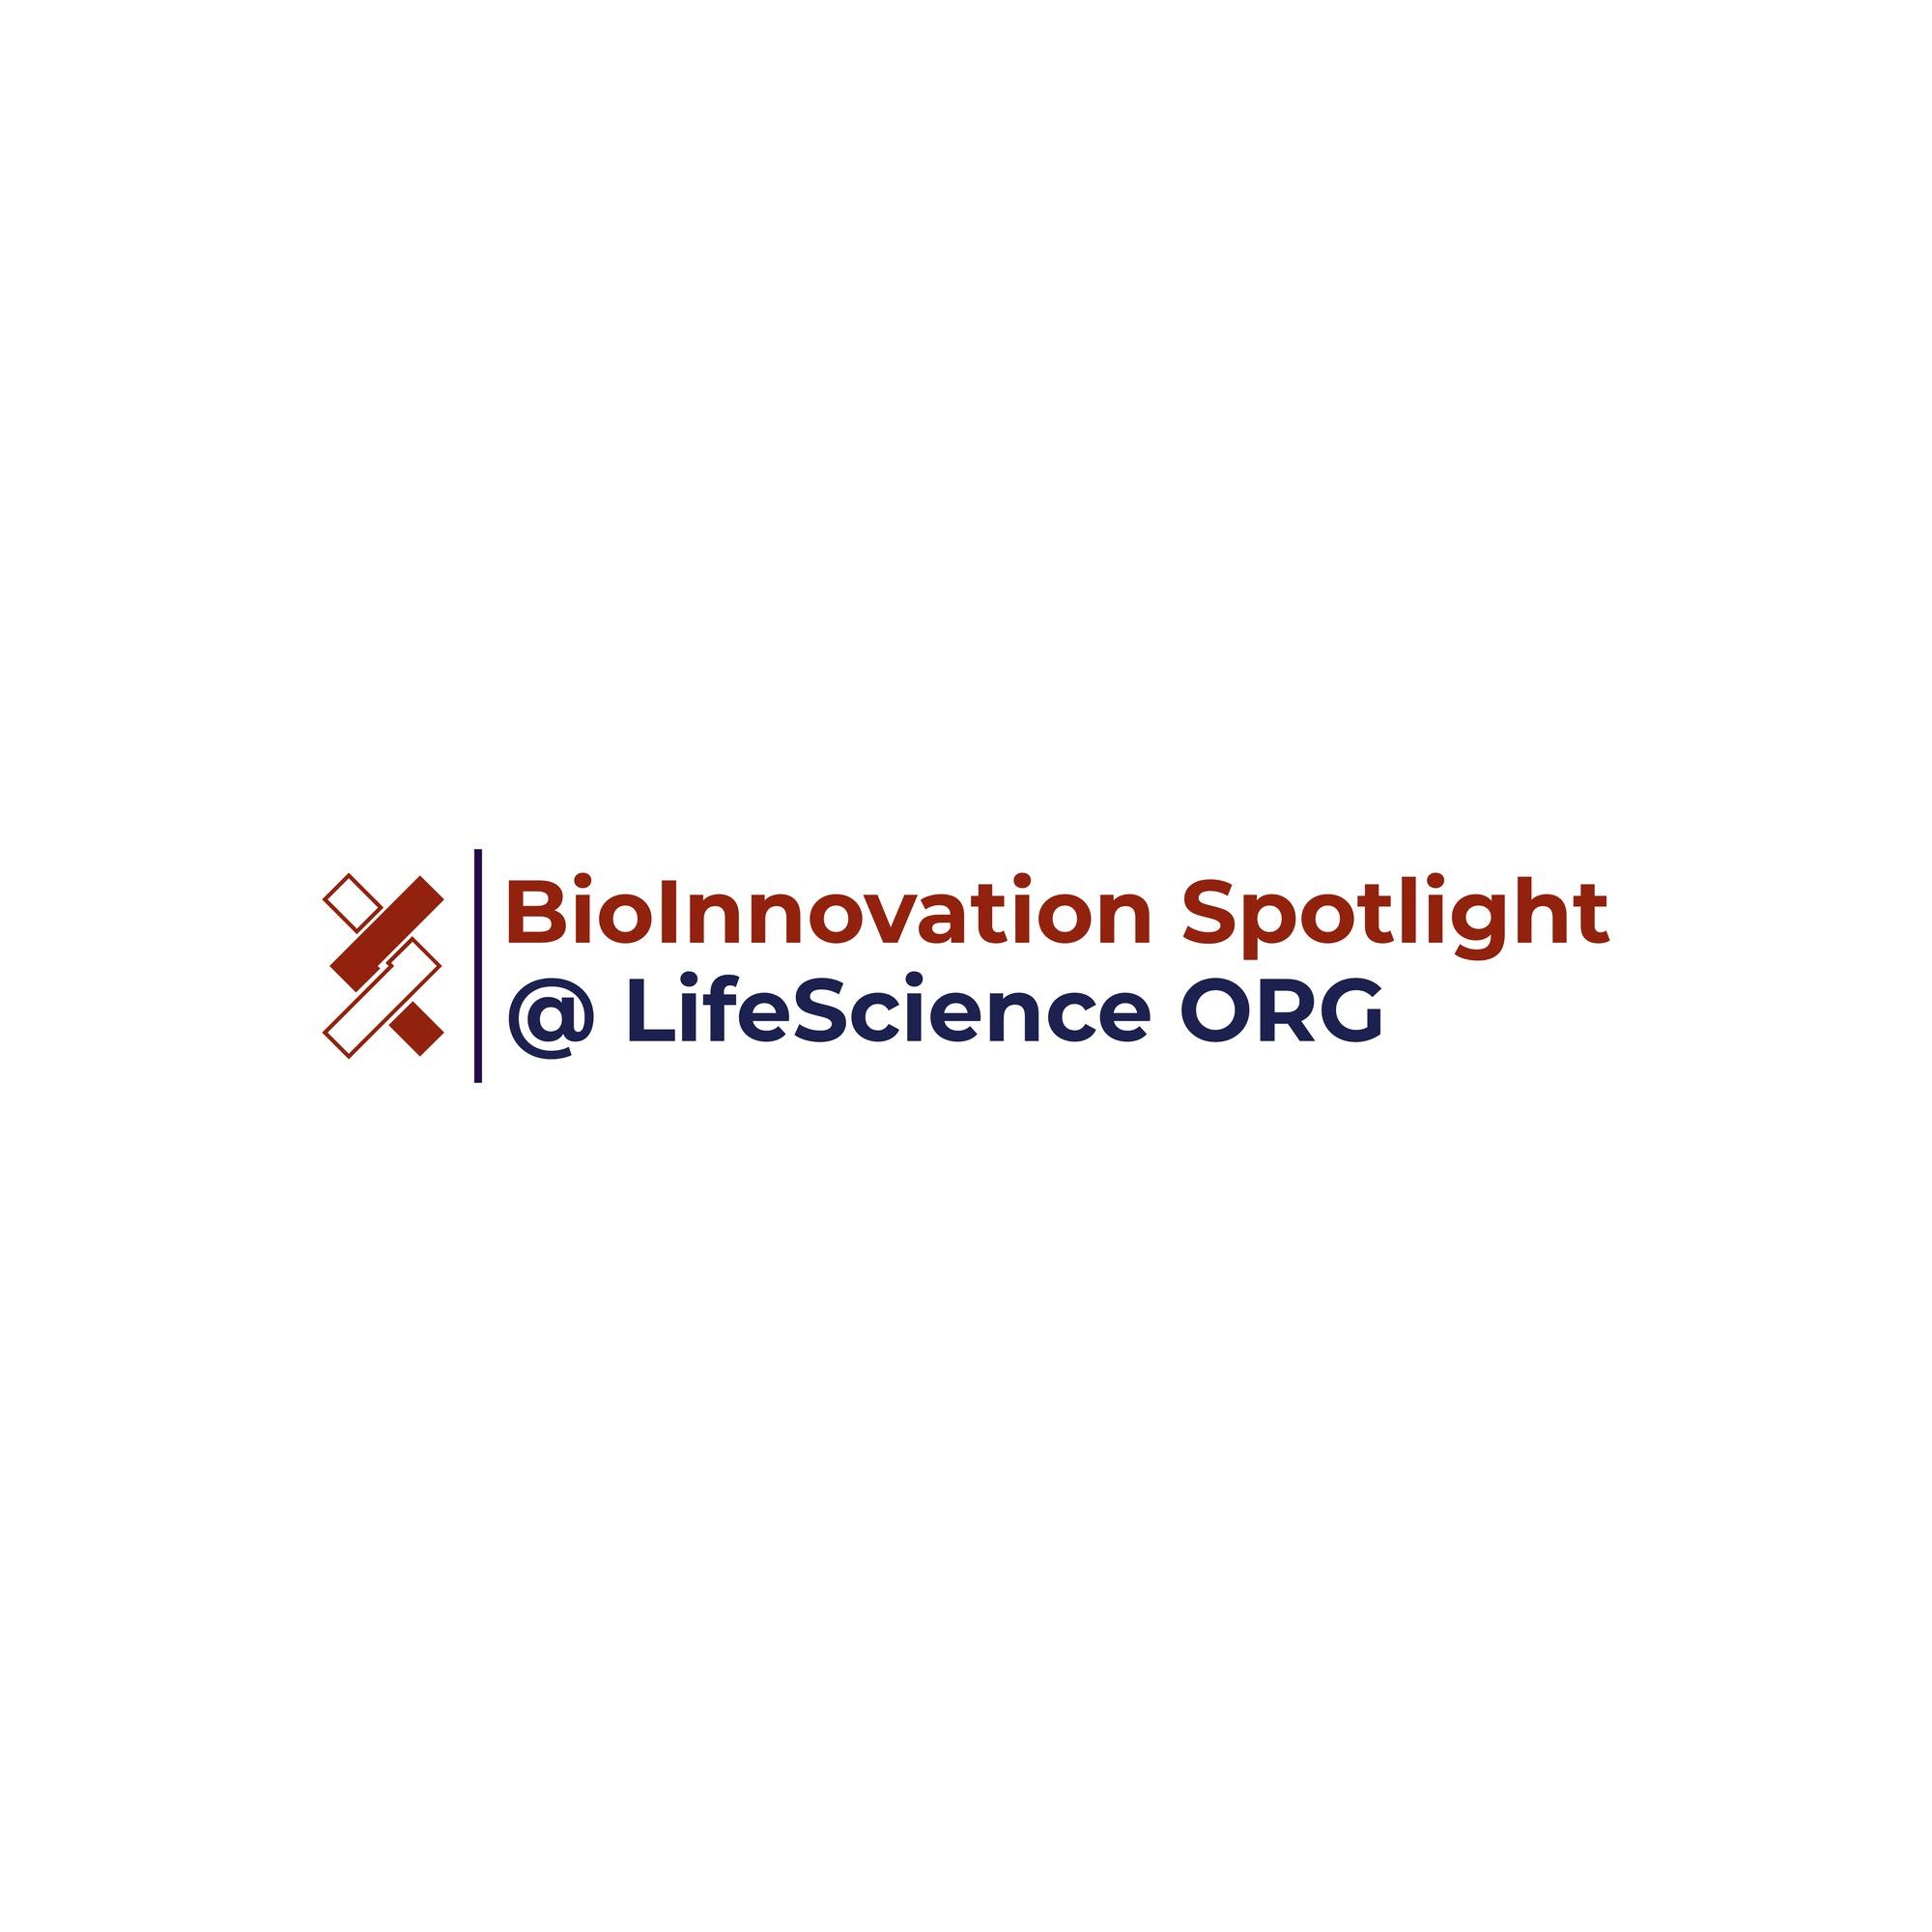 Show artwork for BioInnovation Spotlight